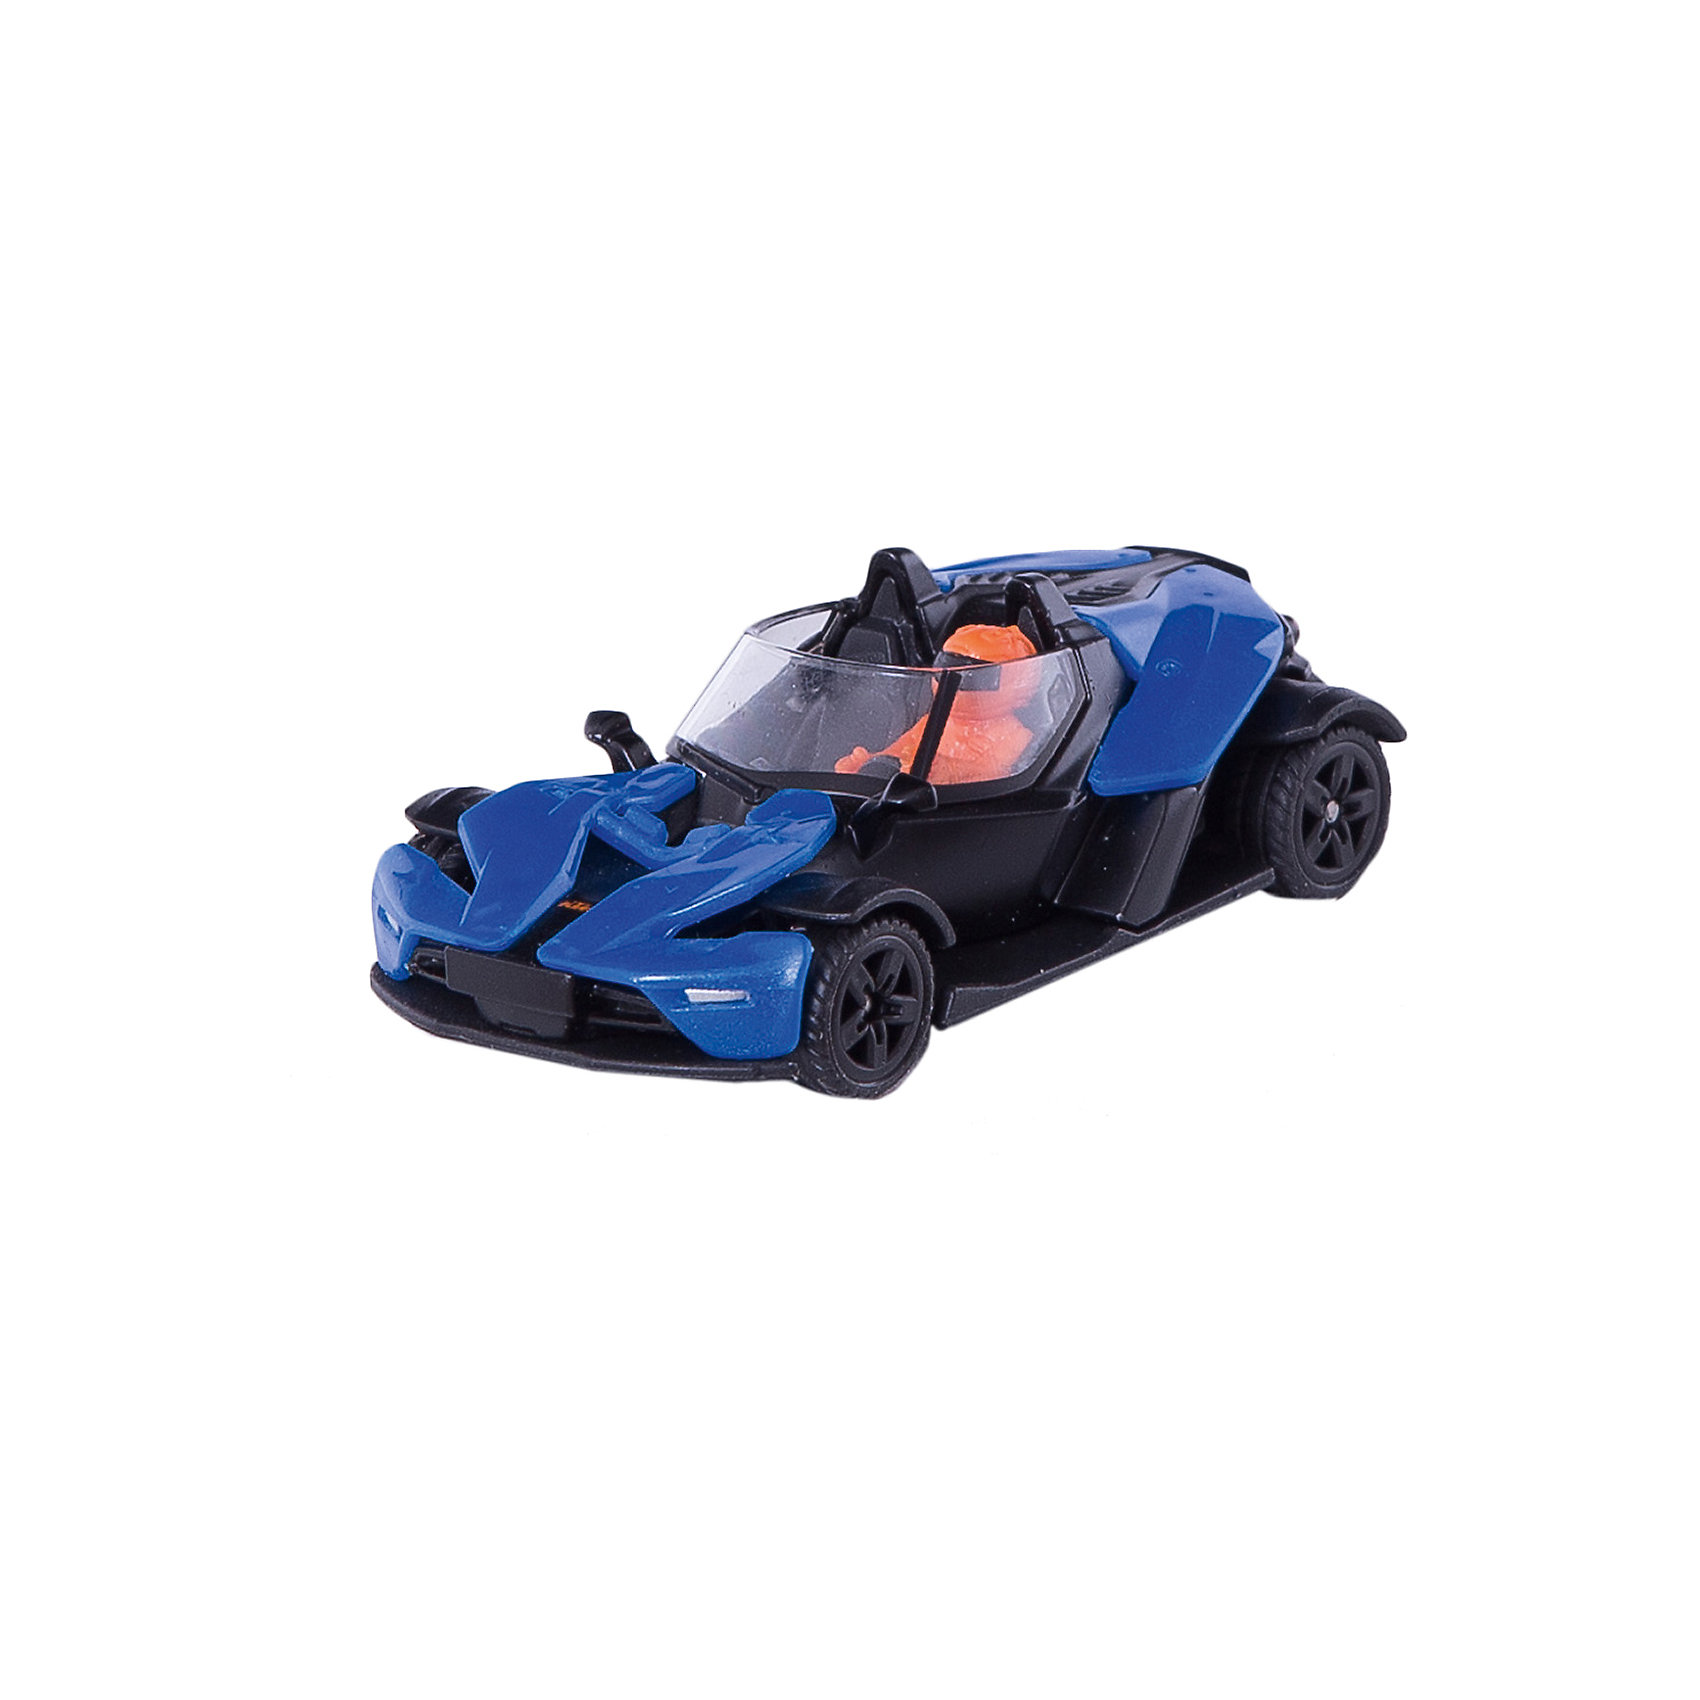 SIKU SIKU 1436 Машинка KTM X-BOW GT игрушка siku ауди r8 8 0 3 7 2 4см 1430